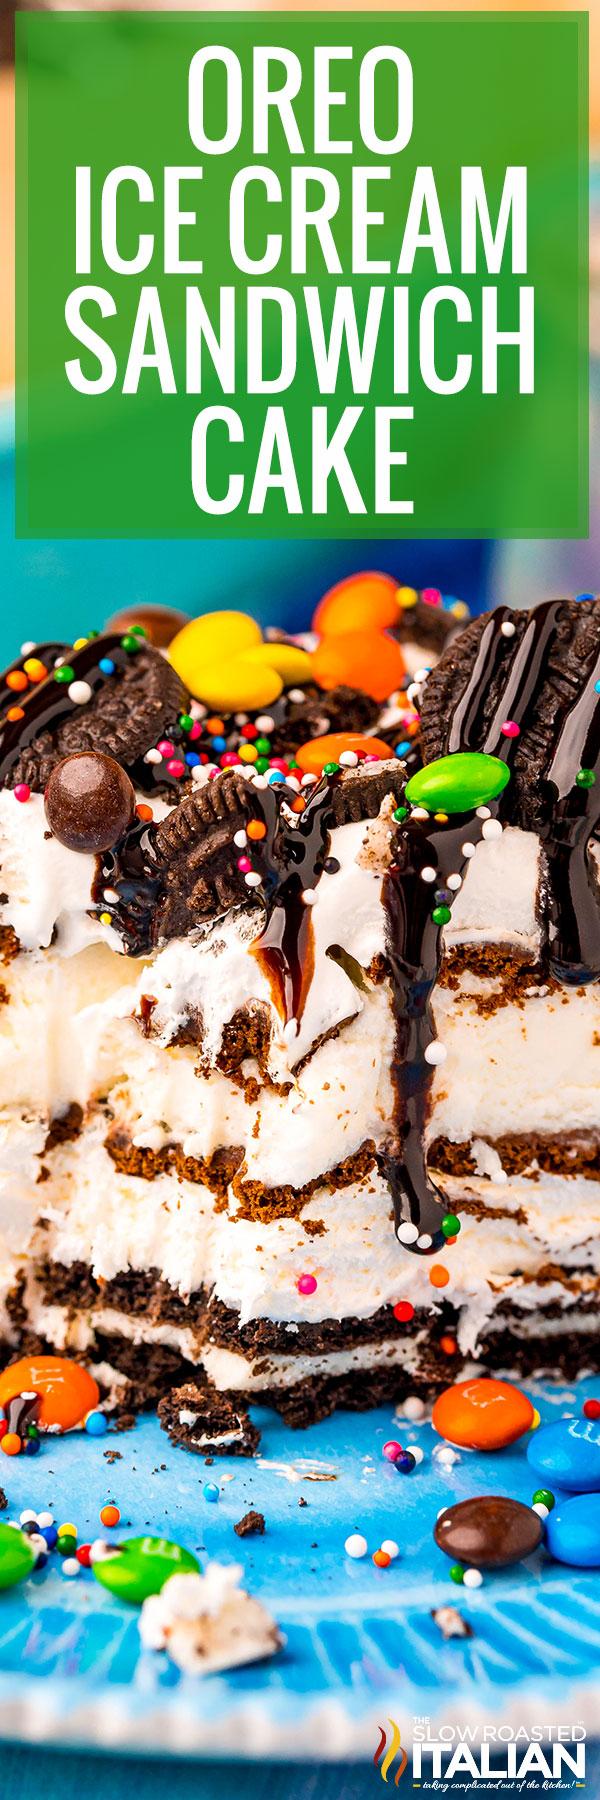 Oreo Ice Cream Sandwich Cake closeup